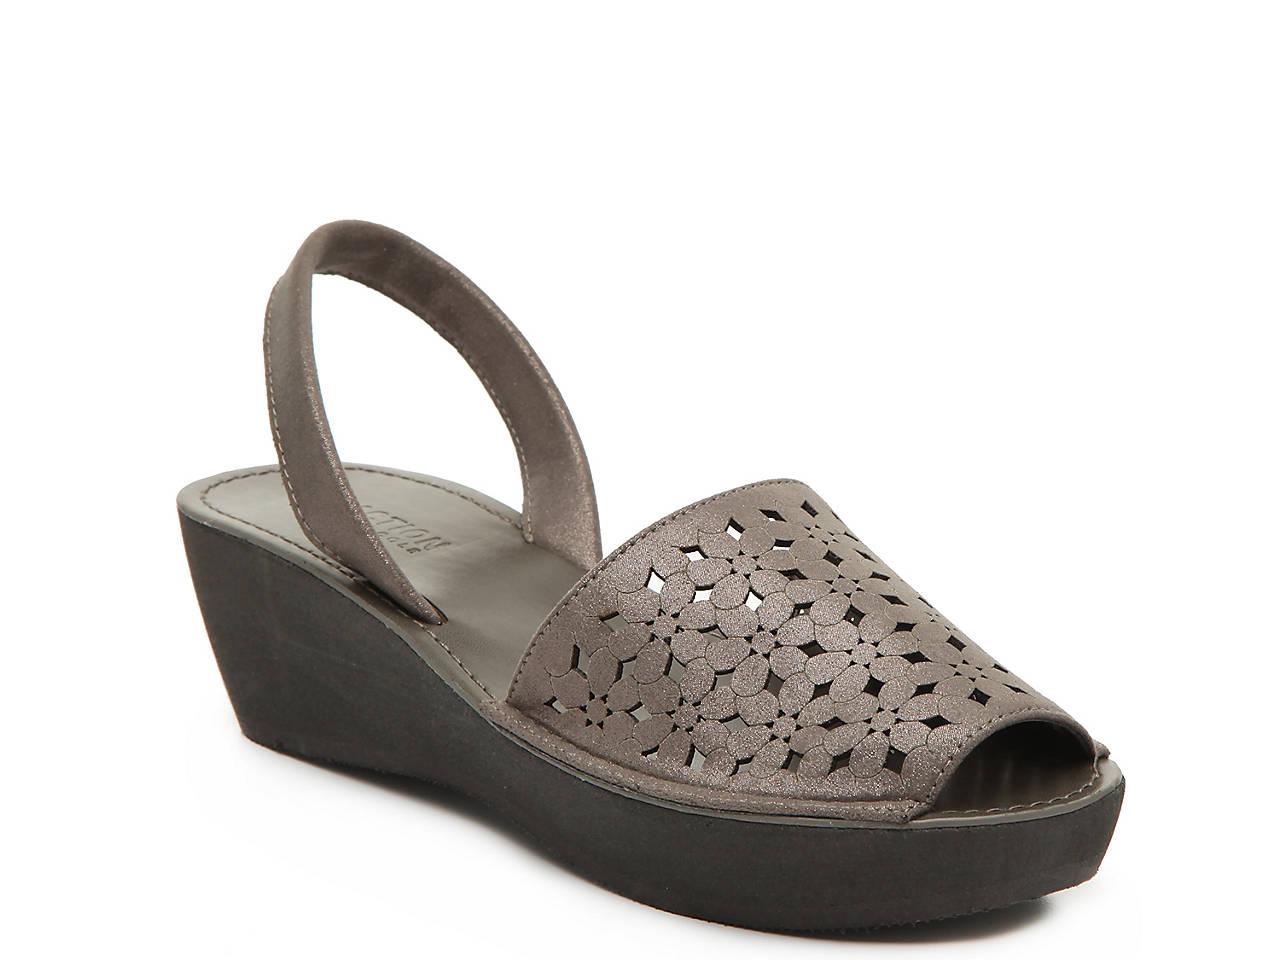 e237889b3c44 Kenneth Cole Reaction Fine Glass Wedge Sandal Women s Shoes